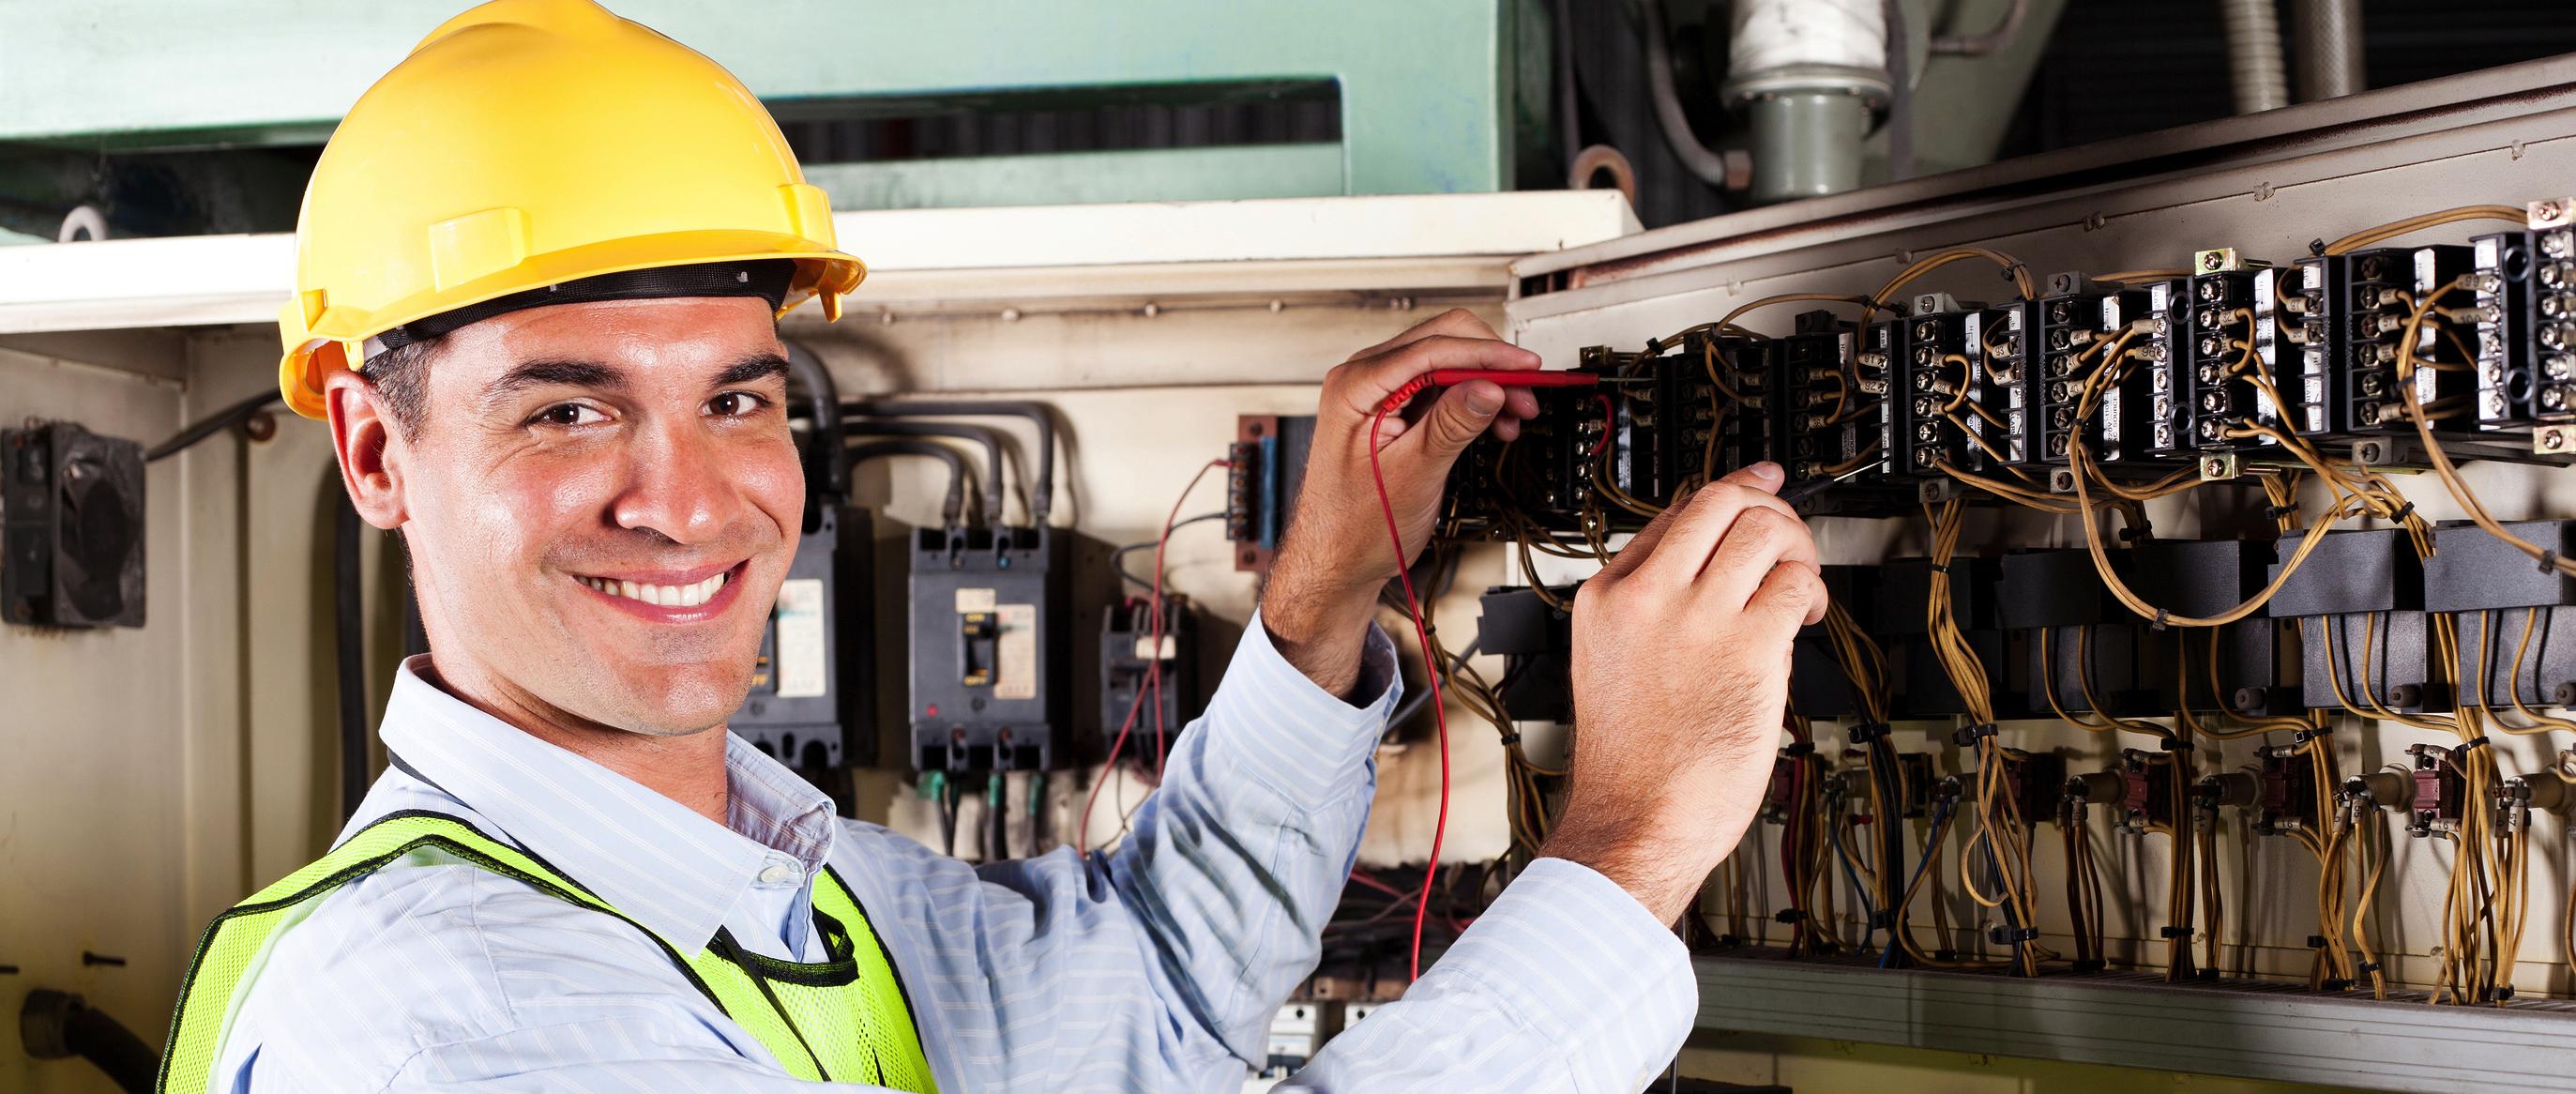 Electrician – Job Description